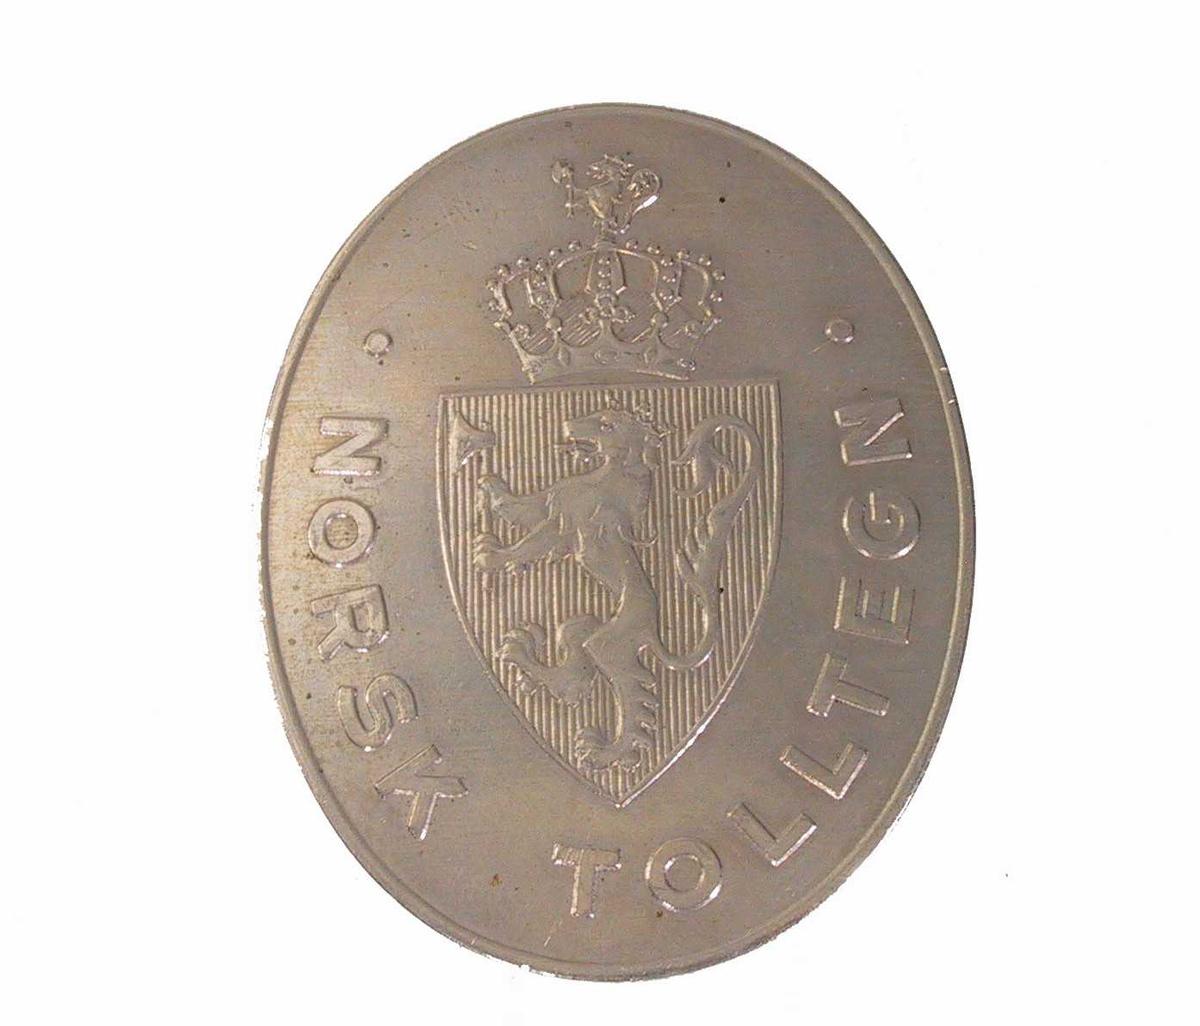 Riksvåpenet; løve med hellebard, krone.